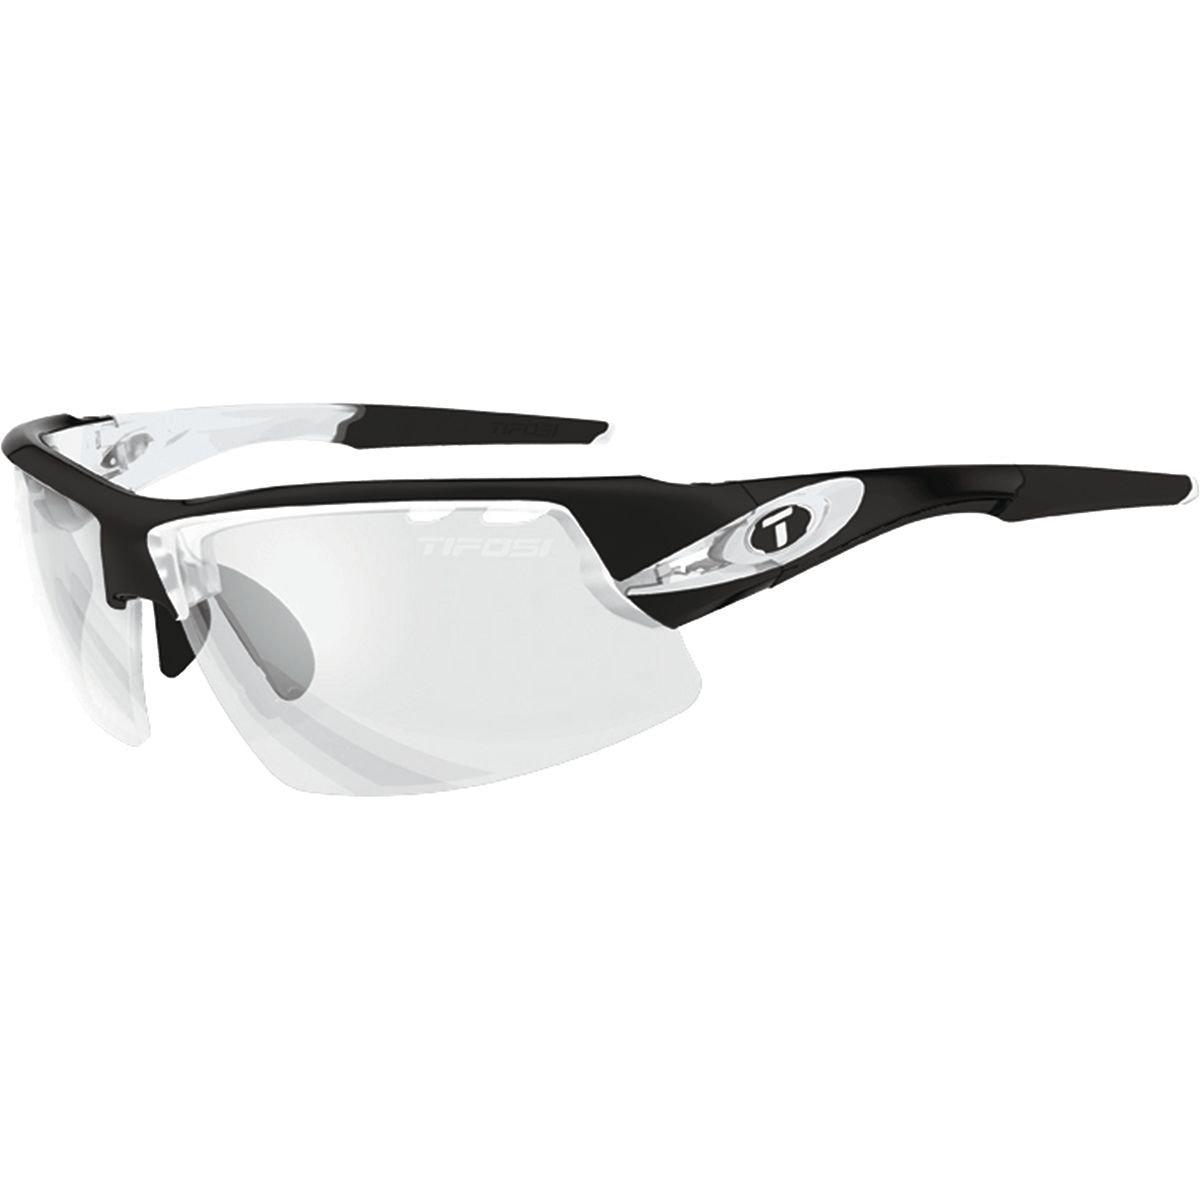 Tifosi Optics Crit Sunglasses with Light Night Fototec Lens